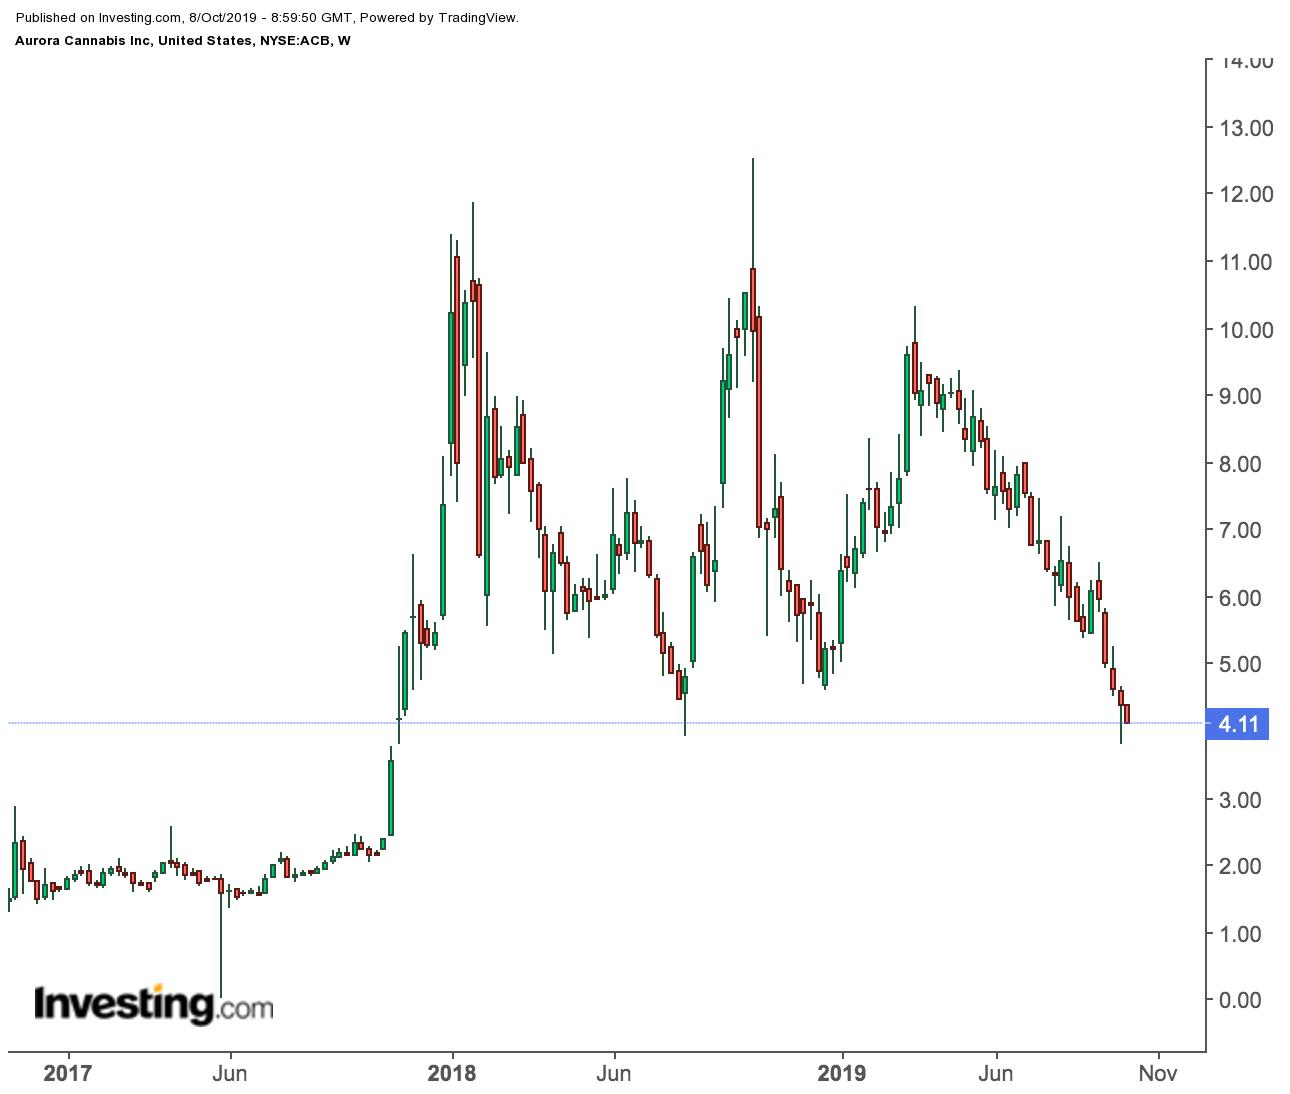 Aurora Cannabis price chart